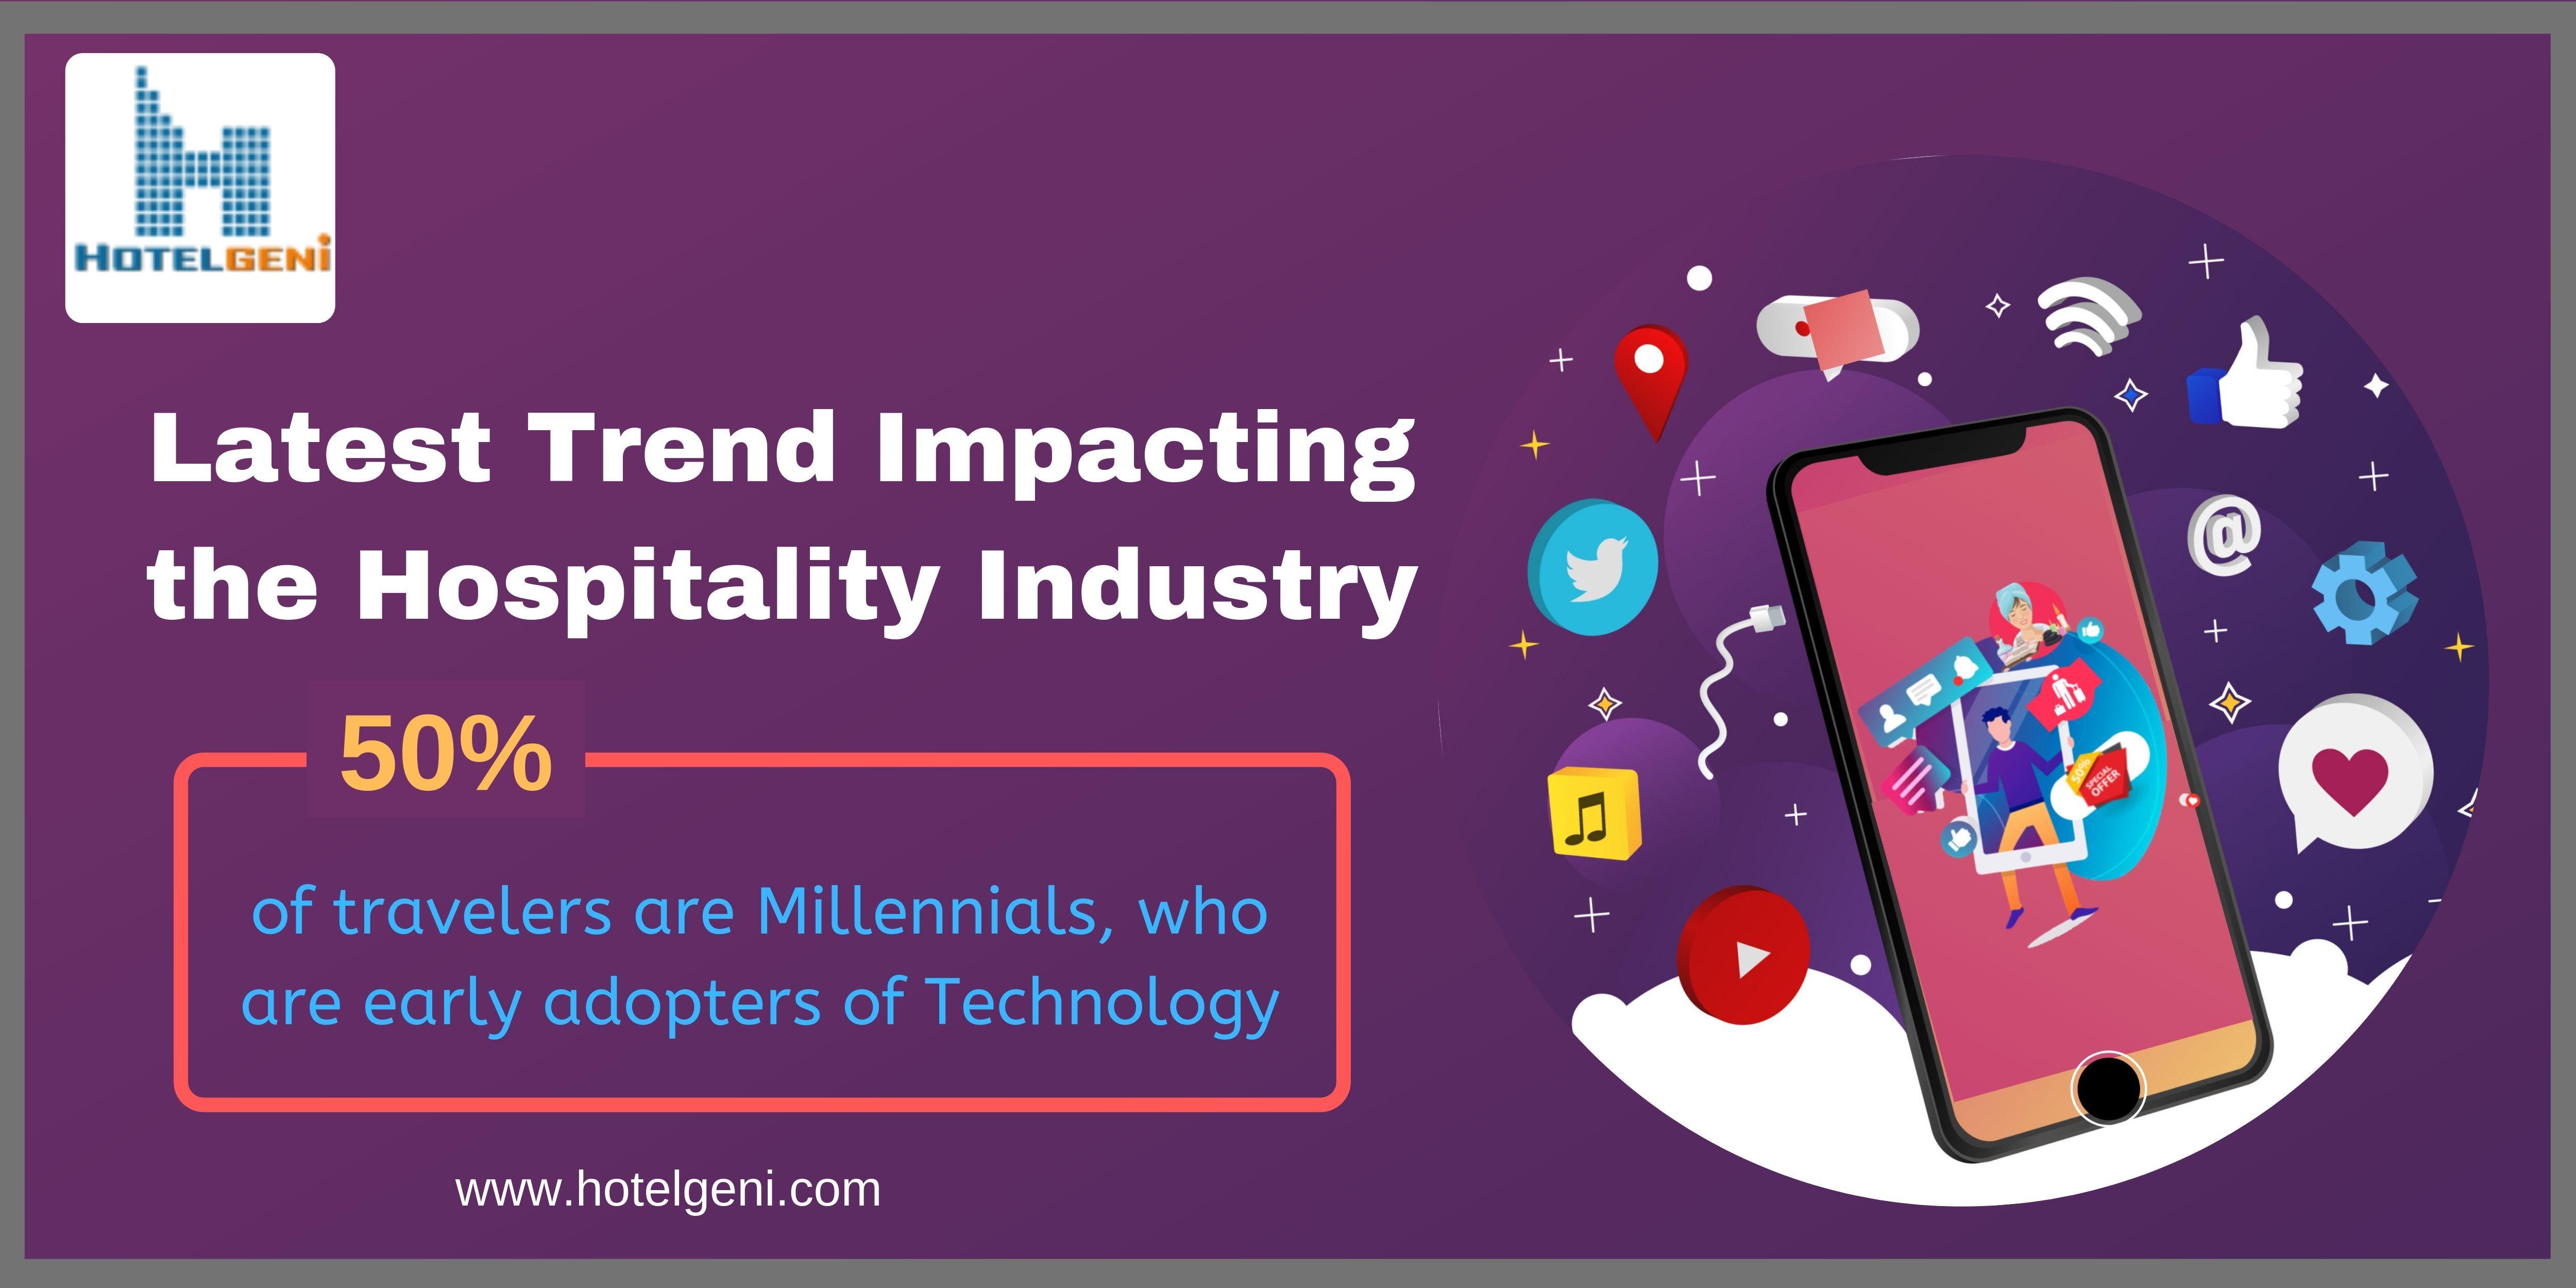 Hotelgeni Mobile App, a multimobile platform to offer